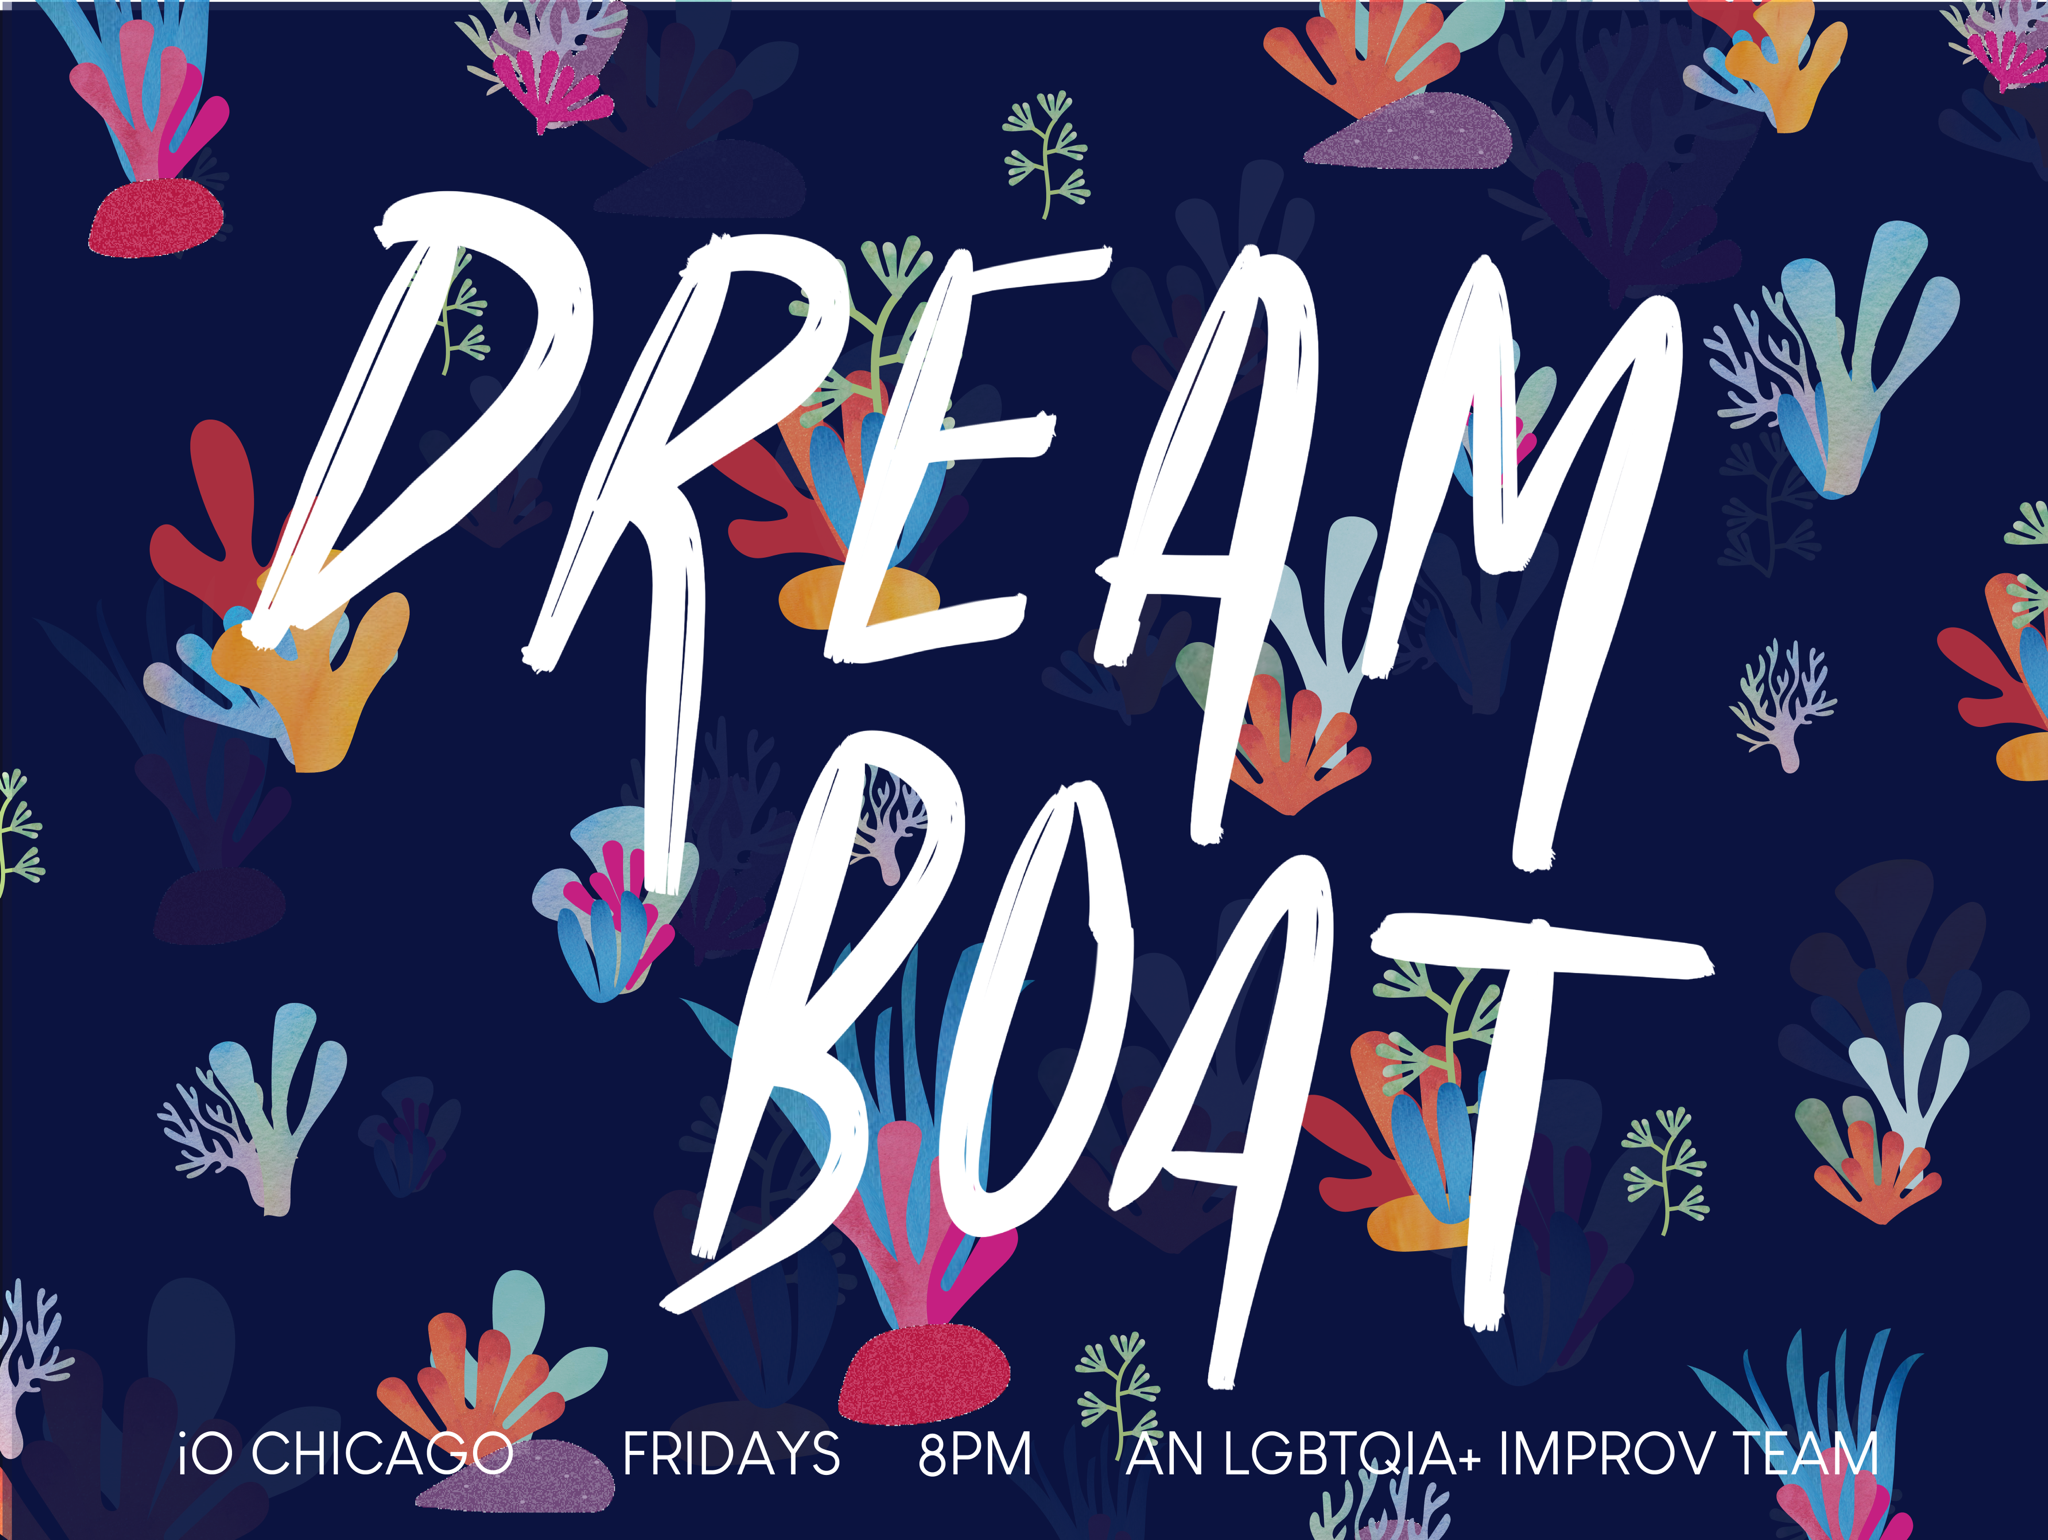 Dreamboat, The Harold Team Stunt Double